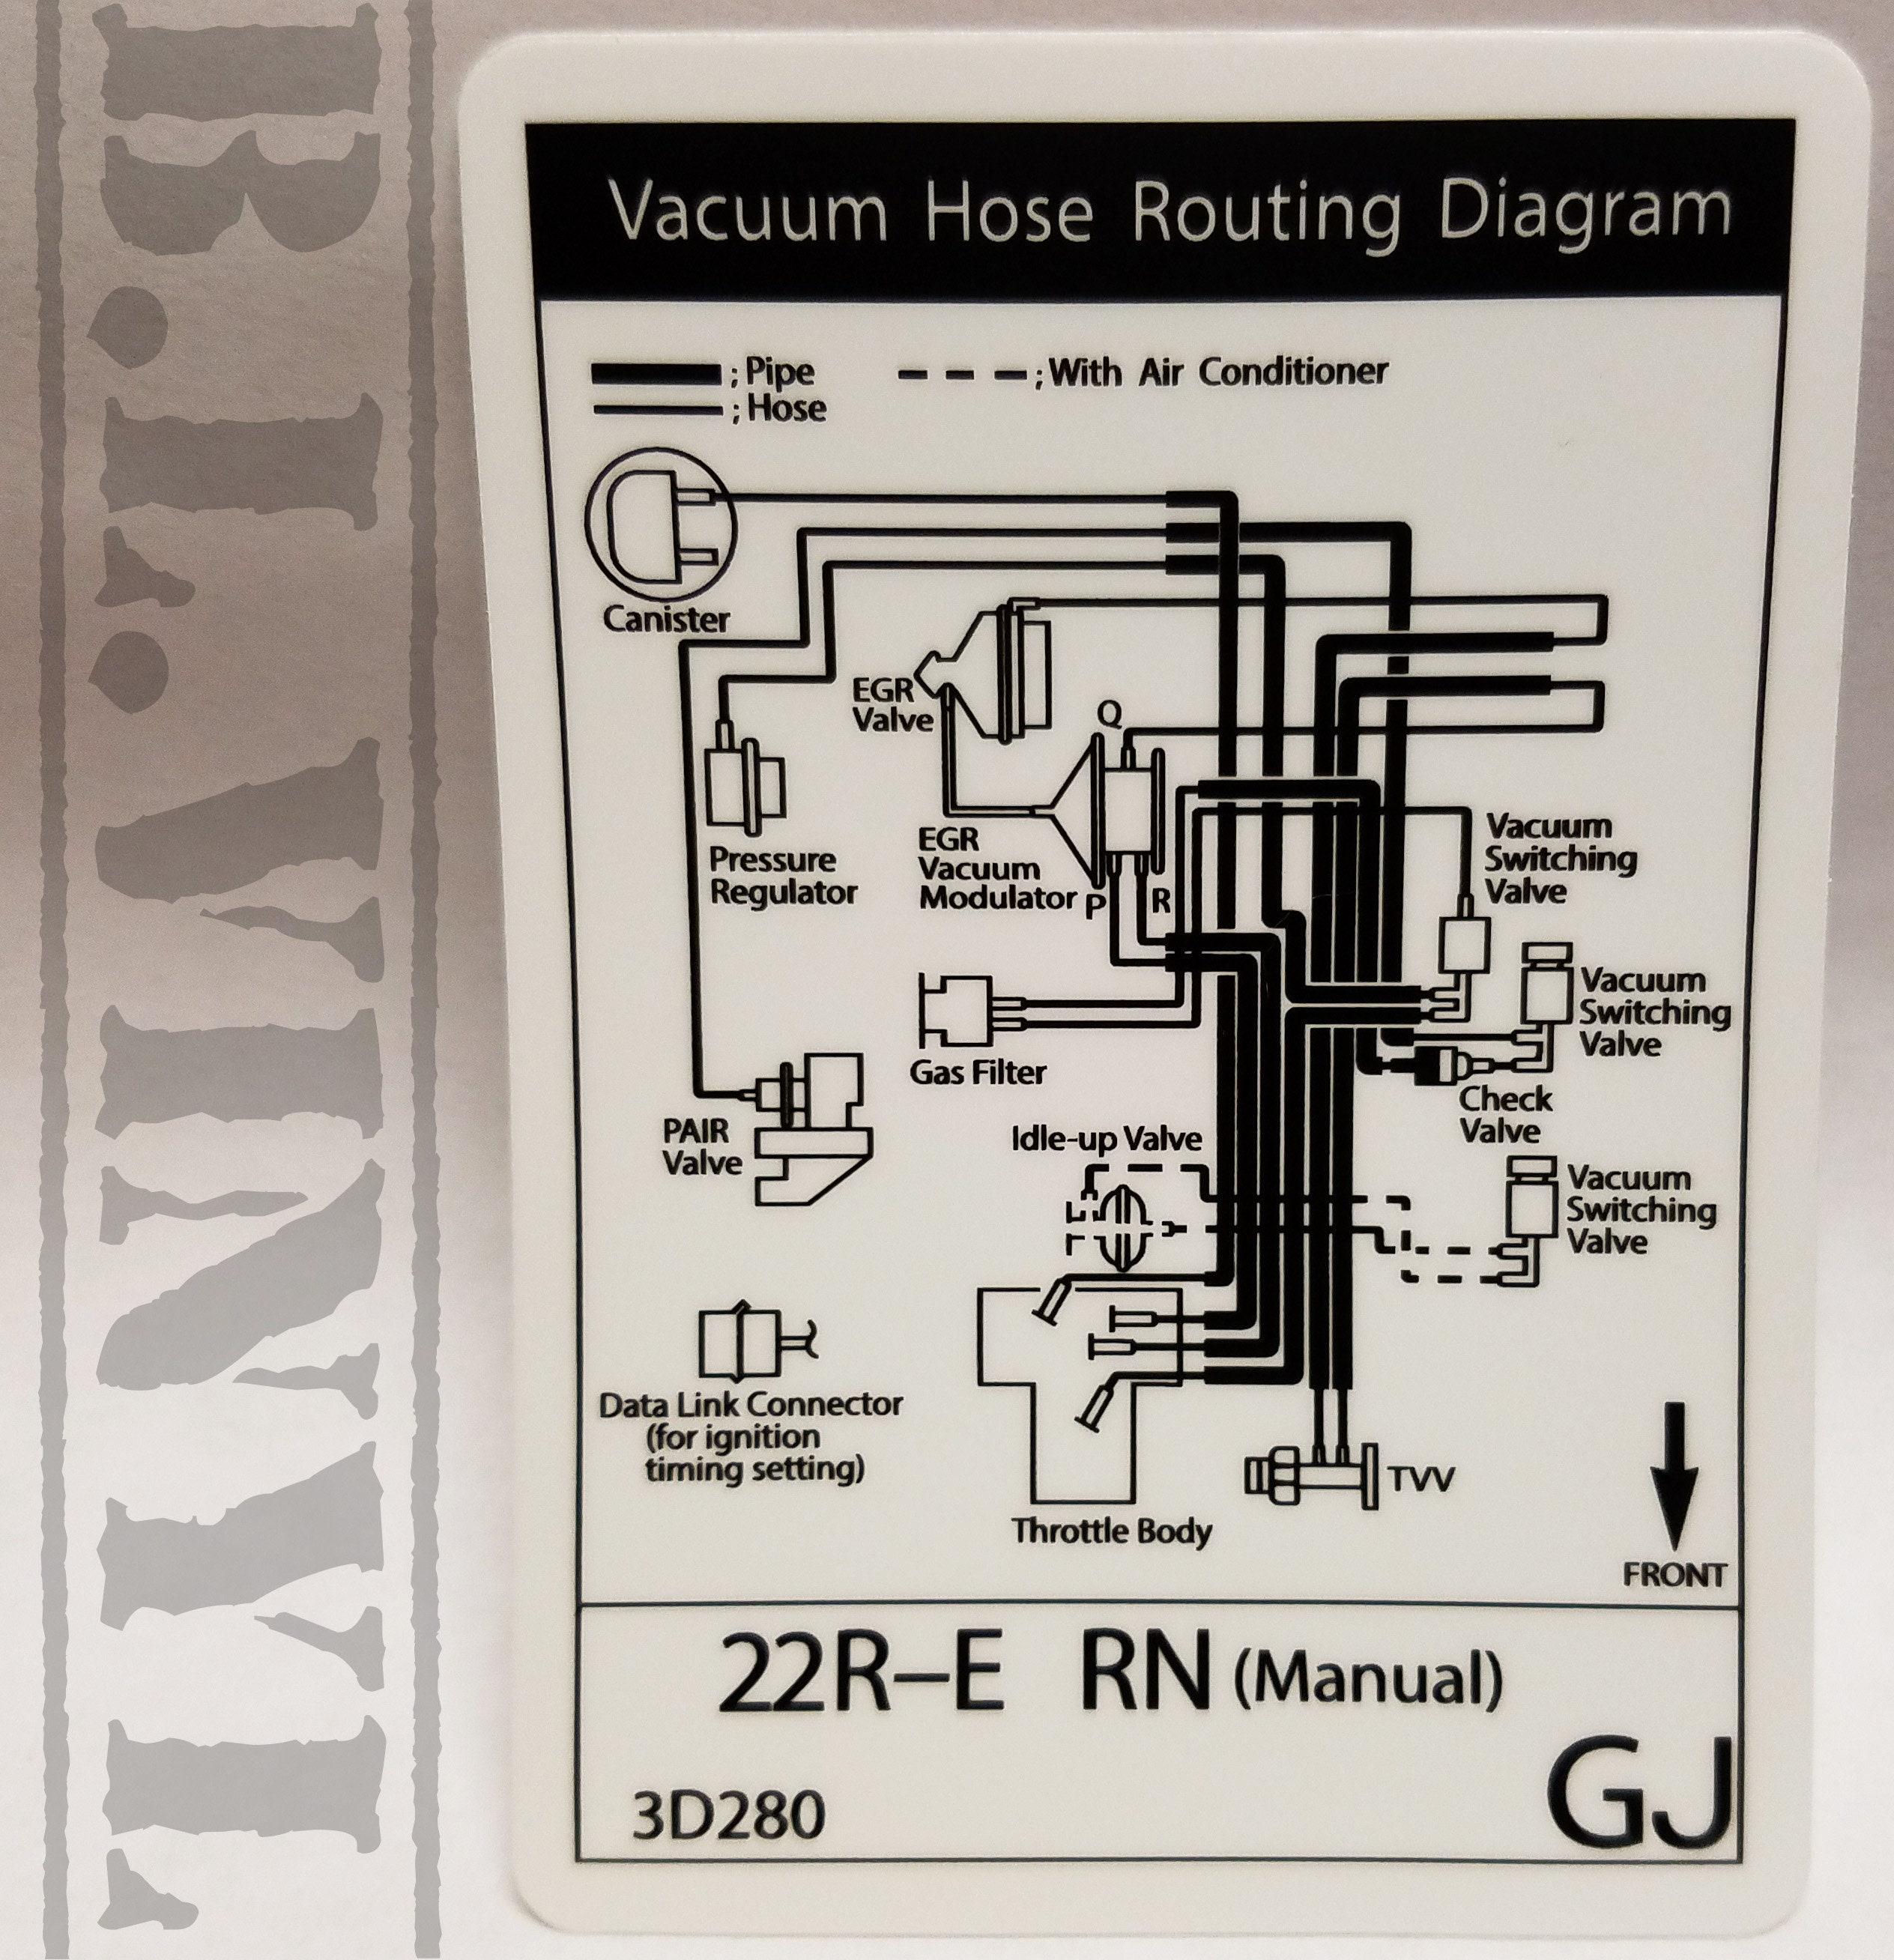 22RE Vacuum Hose Routing Diagram Decal Manual   Etsy